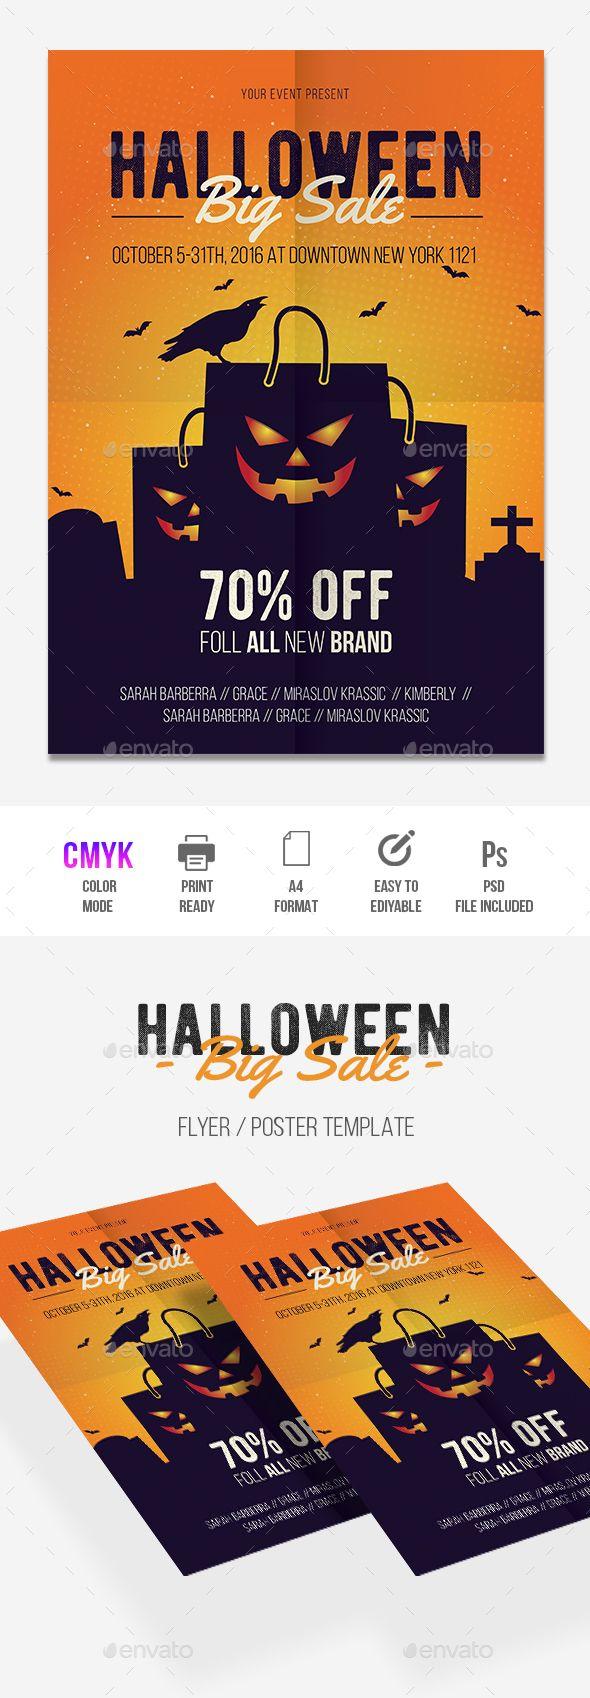 Halloween Sale Flyer Design Template - Holidays Events Flyer Template PSD, AI Illustrator. Download here: https://graphicriver.net/item/halloween-sale/17913955?ref=yinkira